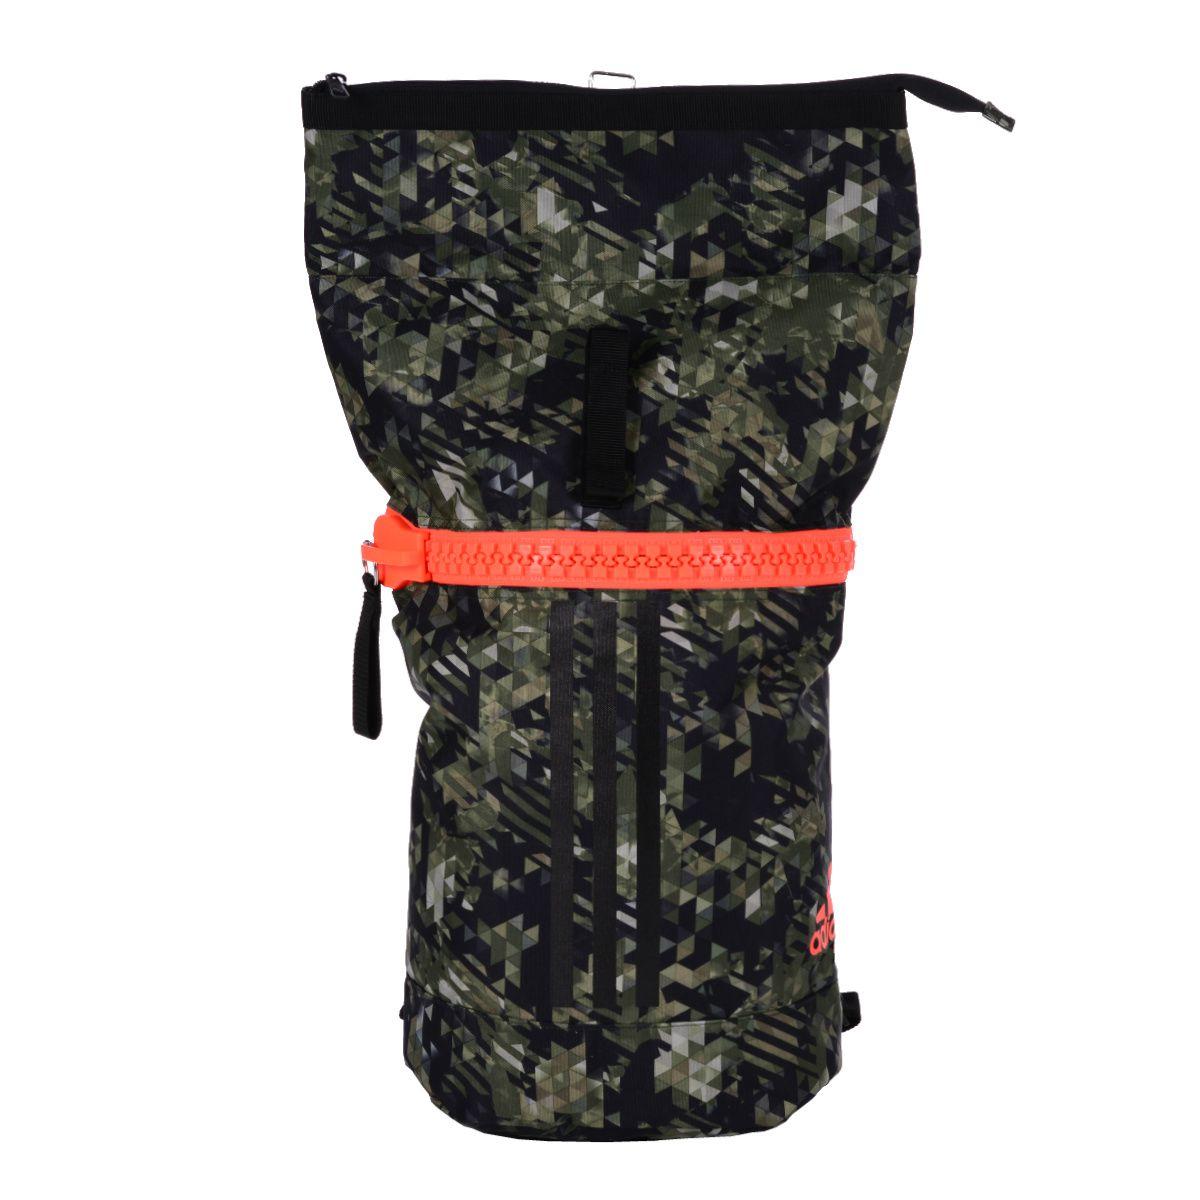 Mochila Adidas Karate Camuflada - Verde/Laranja 25 Litros